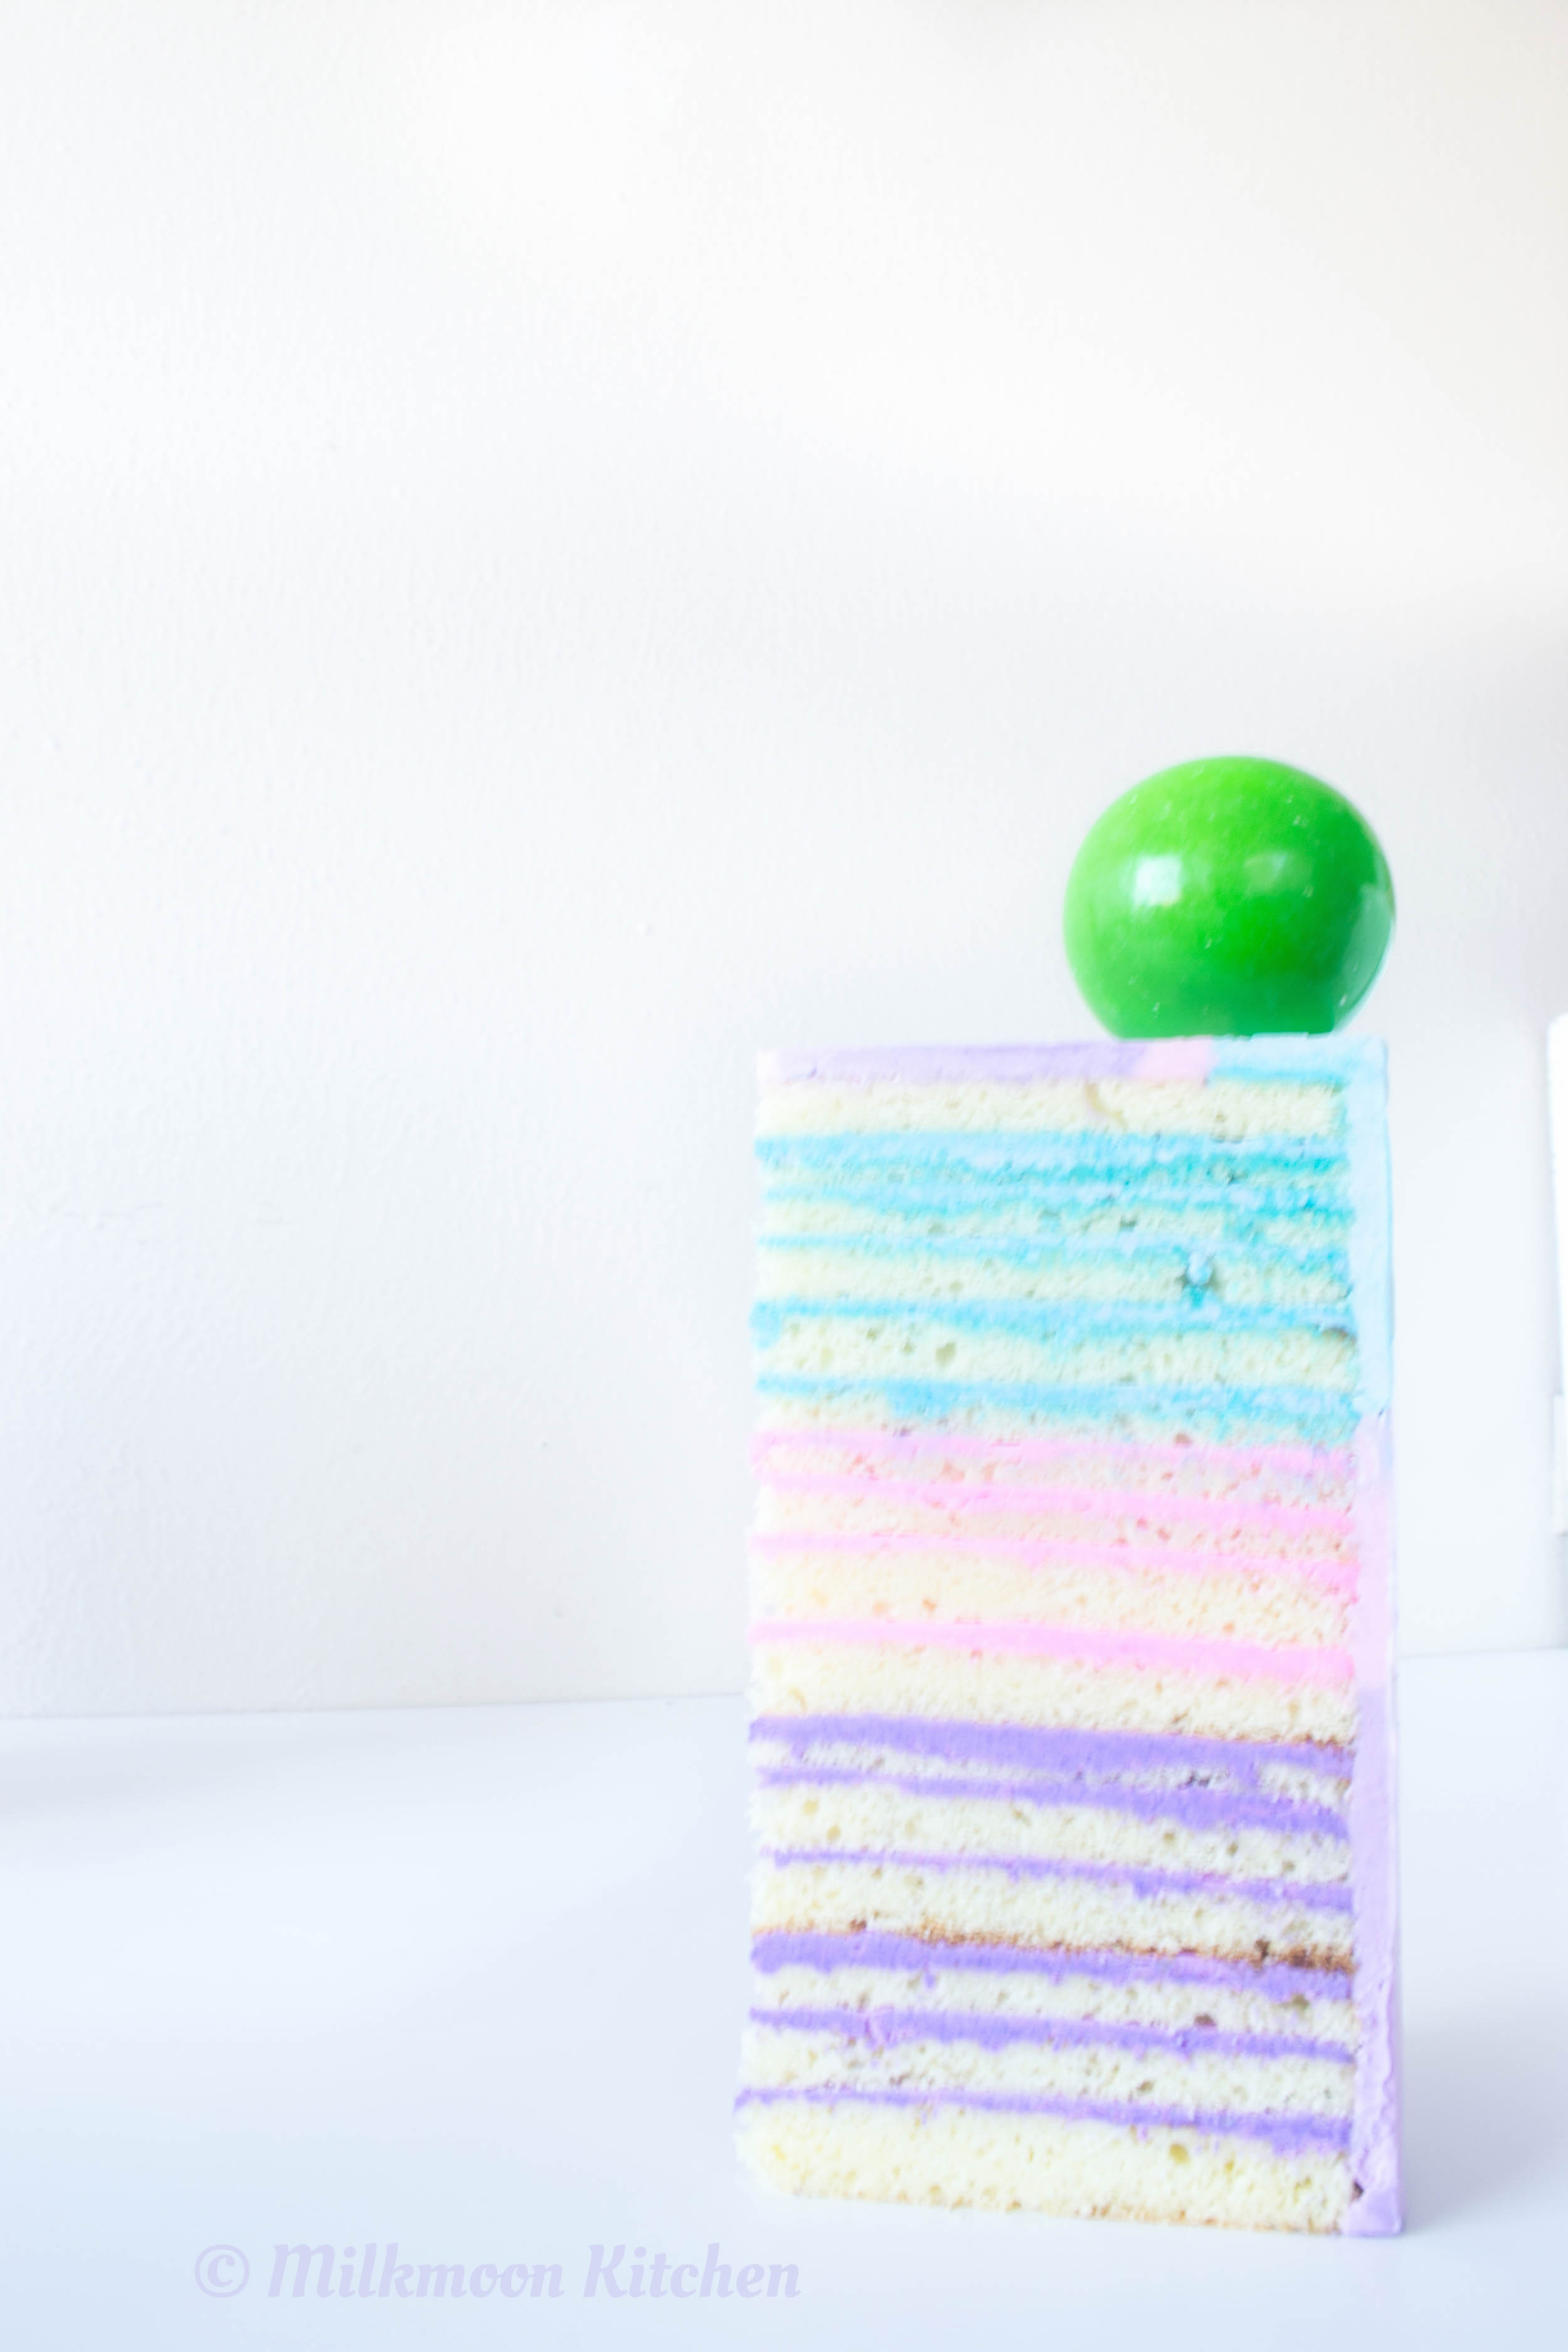 Candy Cake Edited (3 of 7).jpg